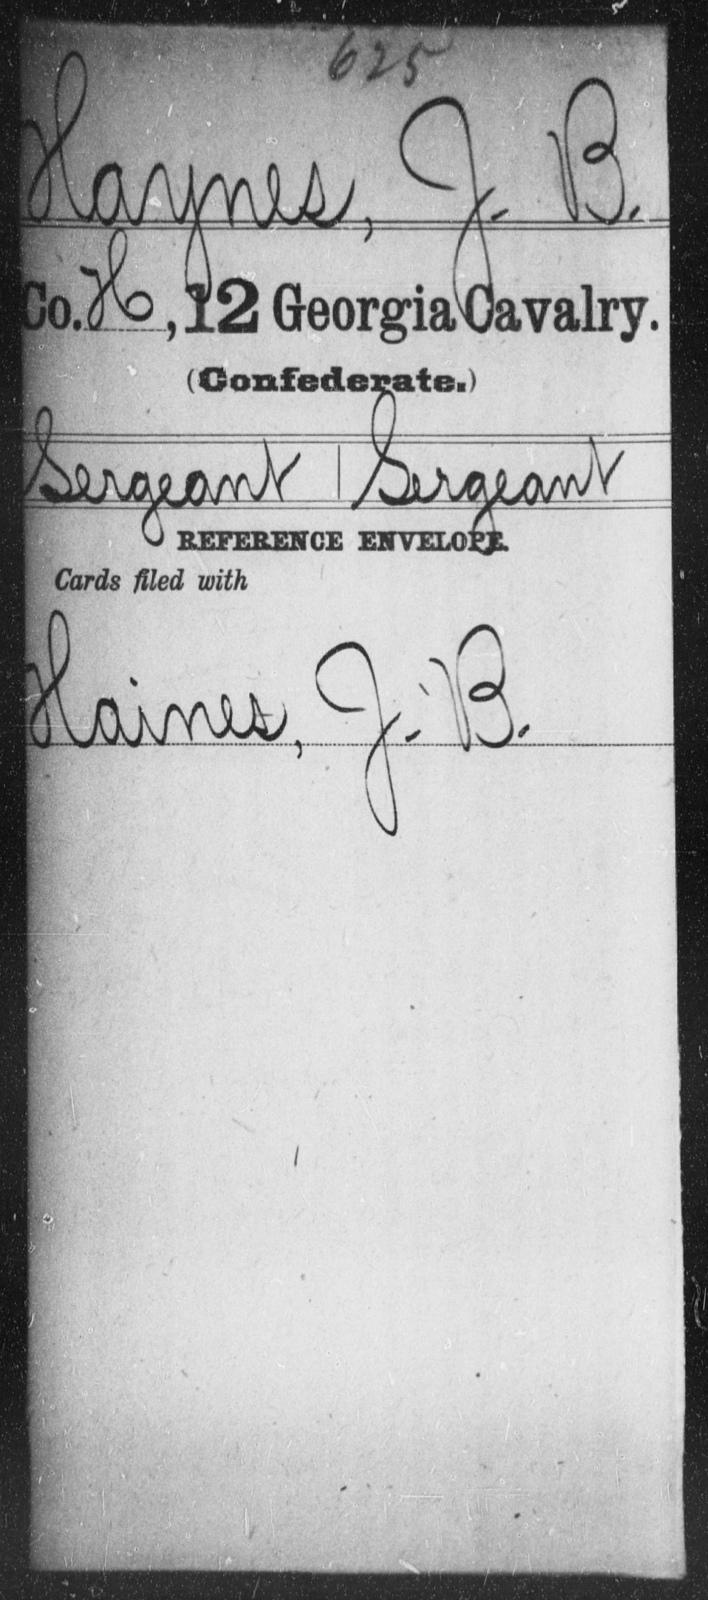 Haynes, J B - 12th Cavalry